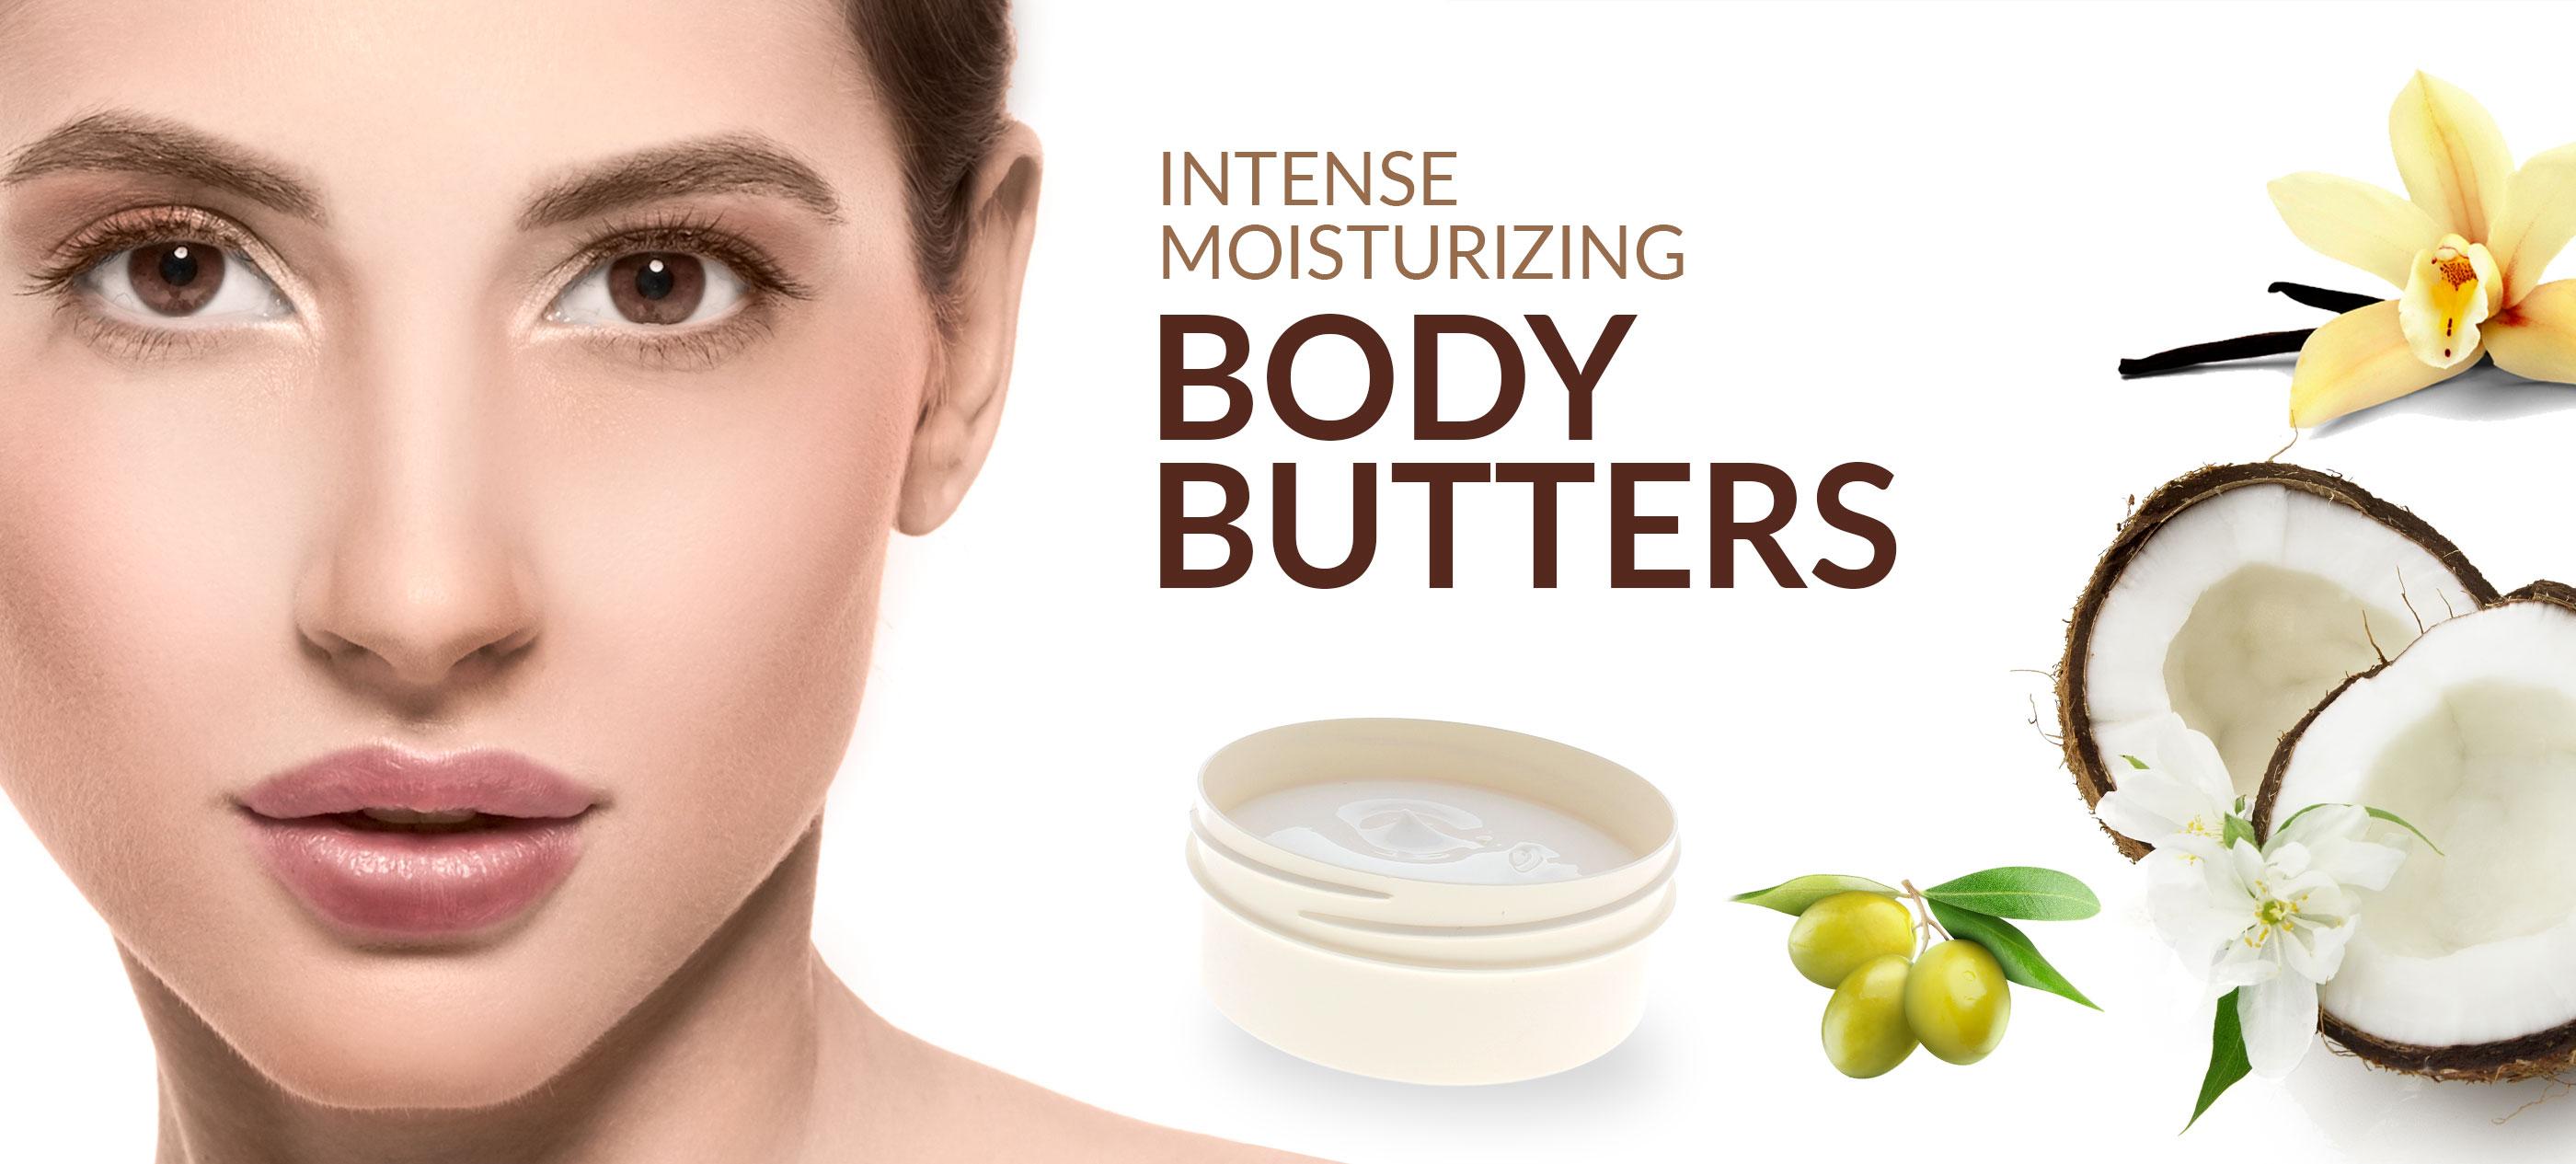 Moisturizing Body Butters Delon Laboratories